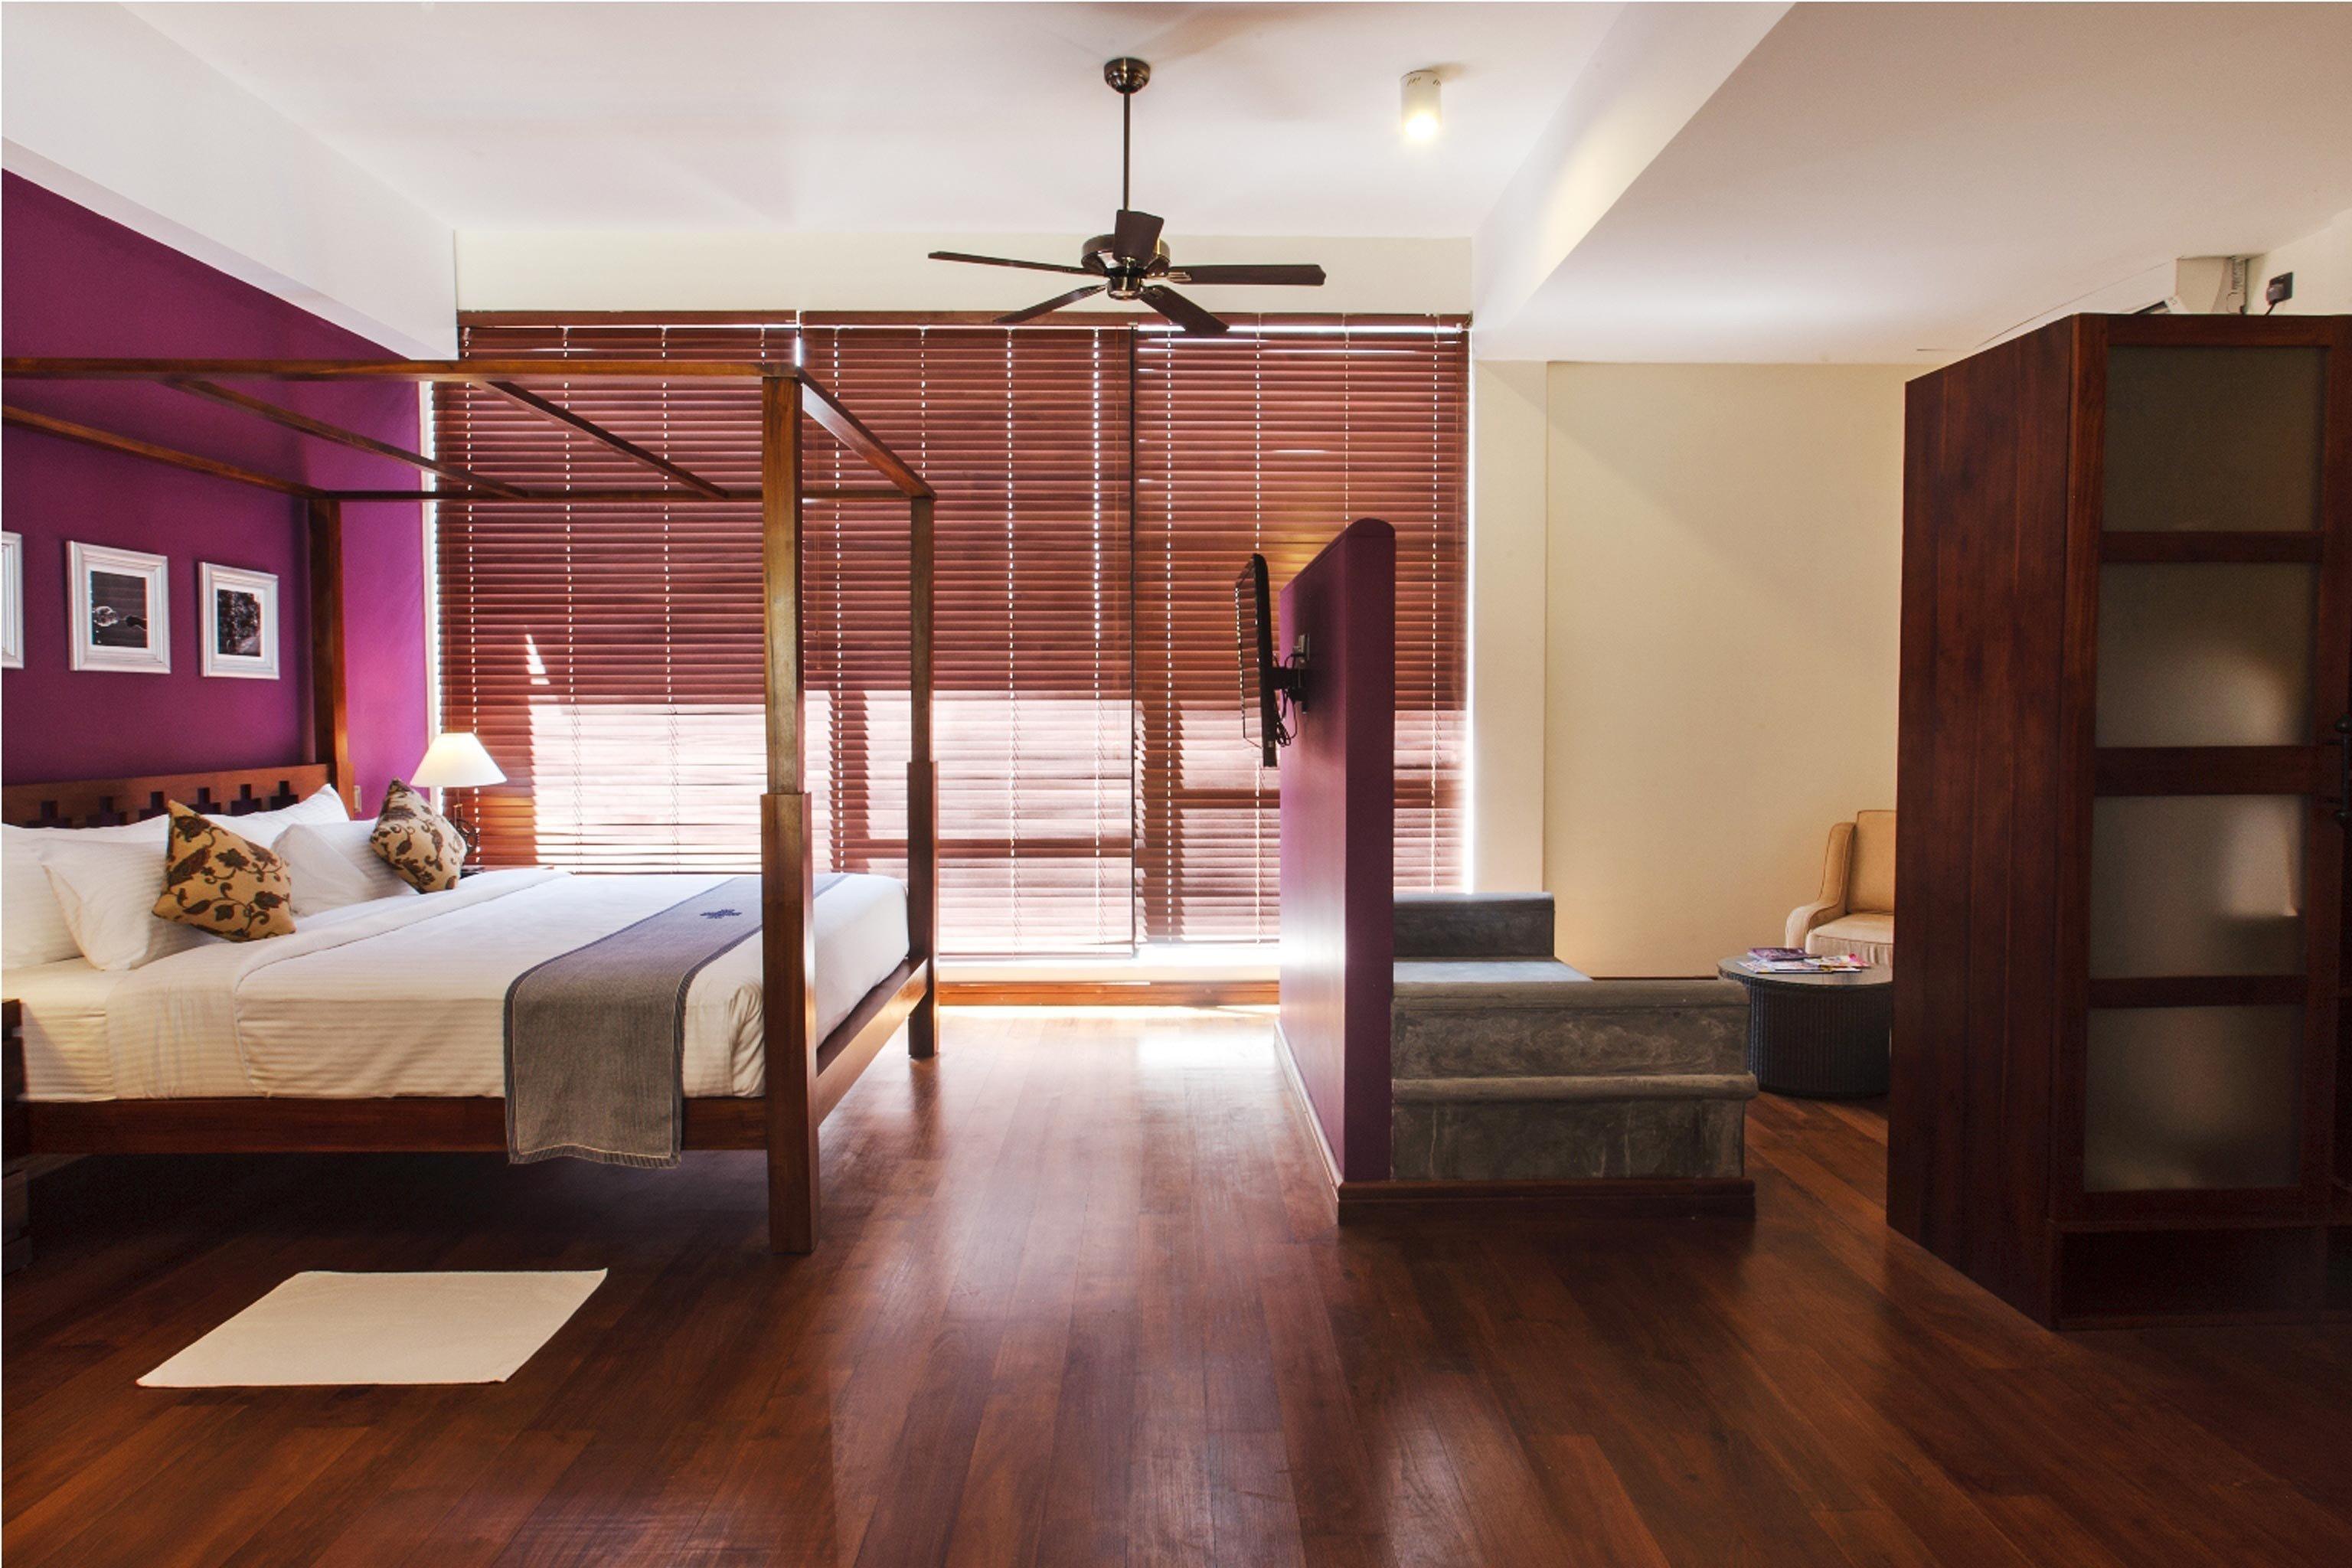 Bedroom Classic Suite property living room hardwood wood flooring home flooring laminate flooring loft